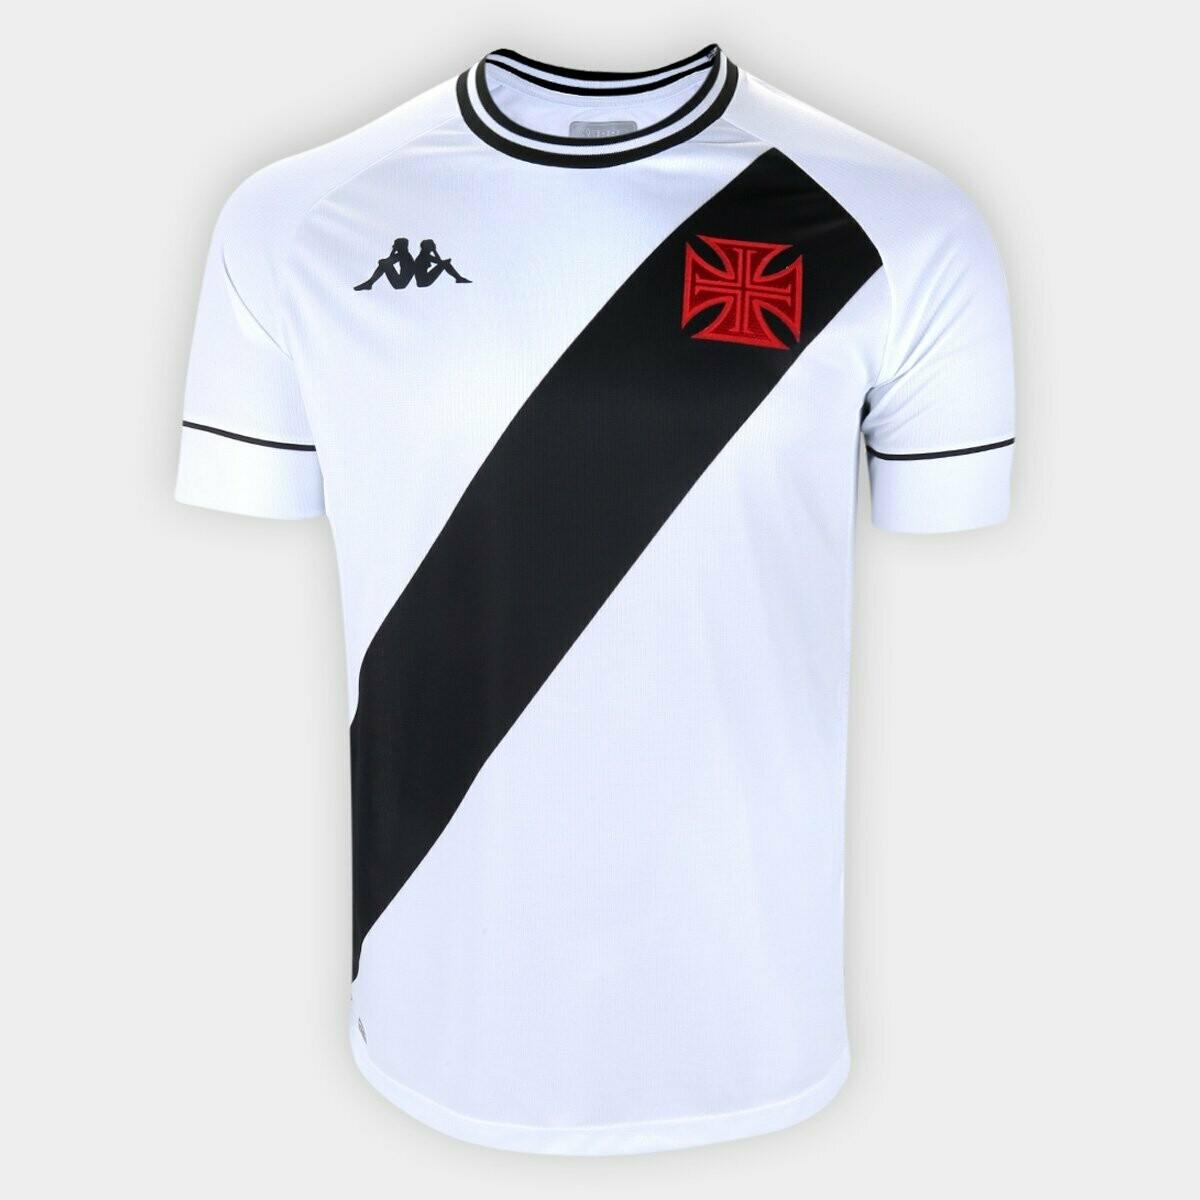 Camisa Vasco II 20/21  Torcedor Kappa Masculina - Branco e Preto